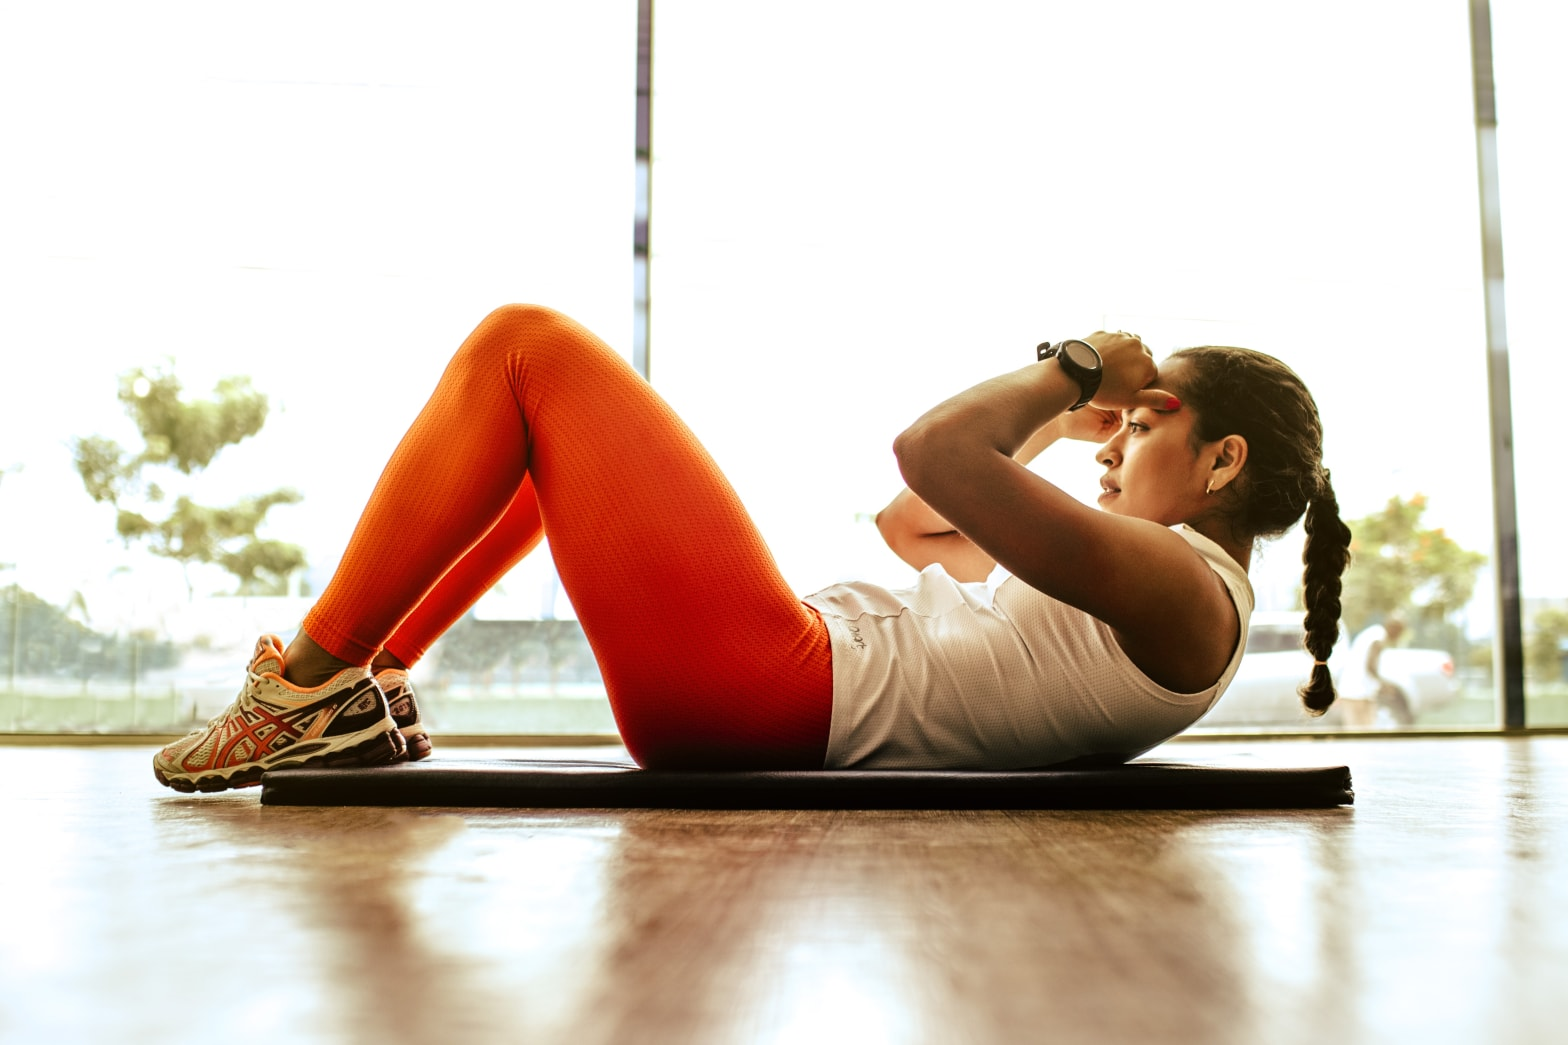 10 ways to keep fit during Corona crisis